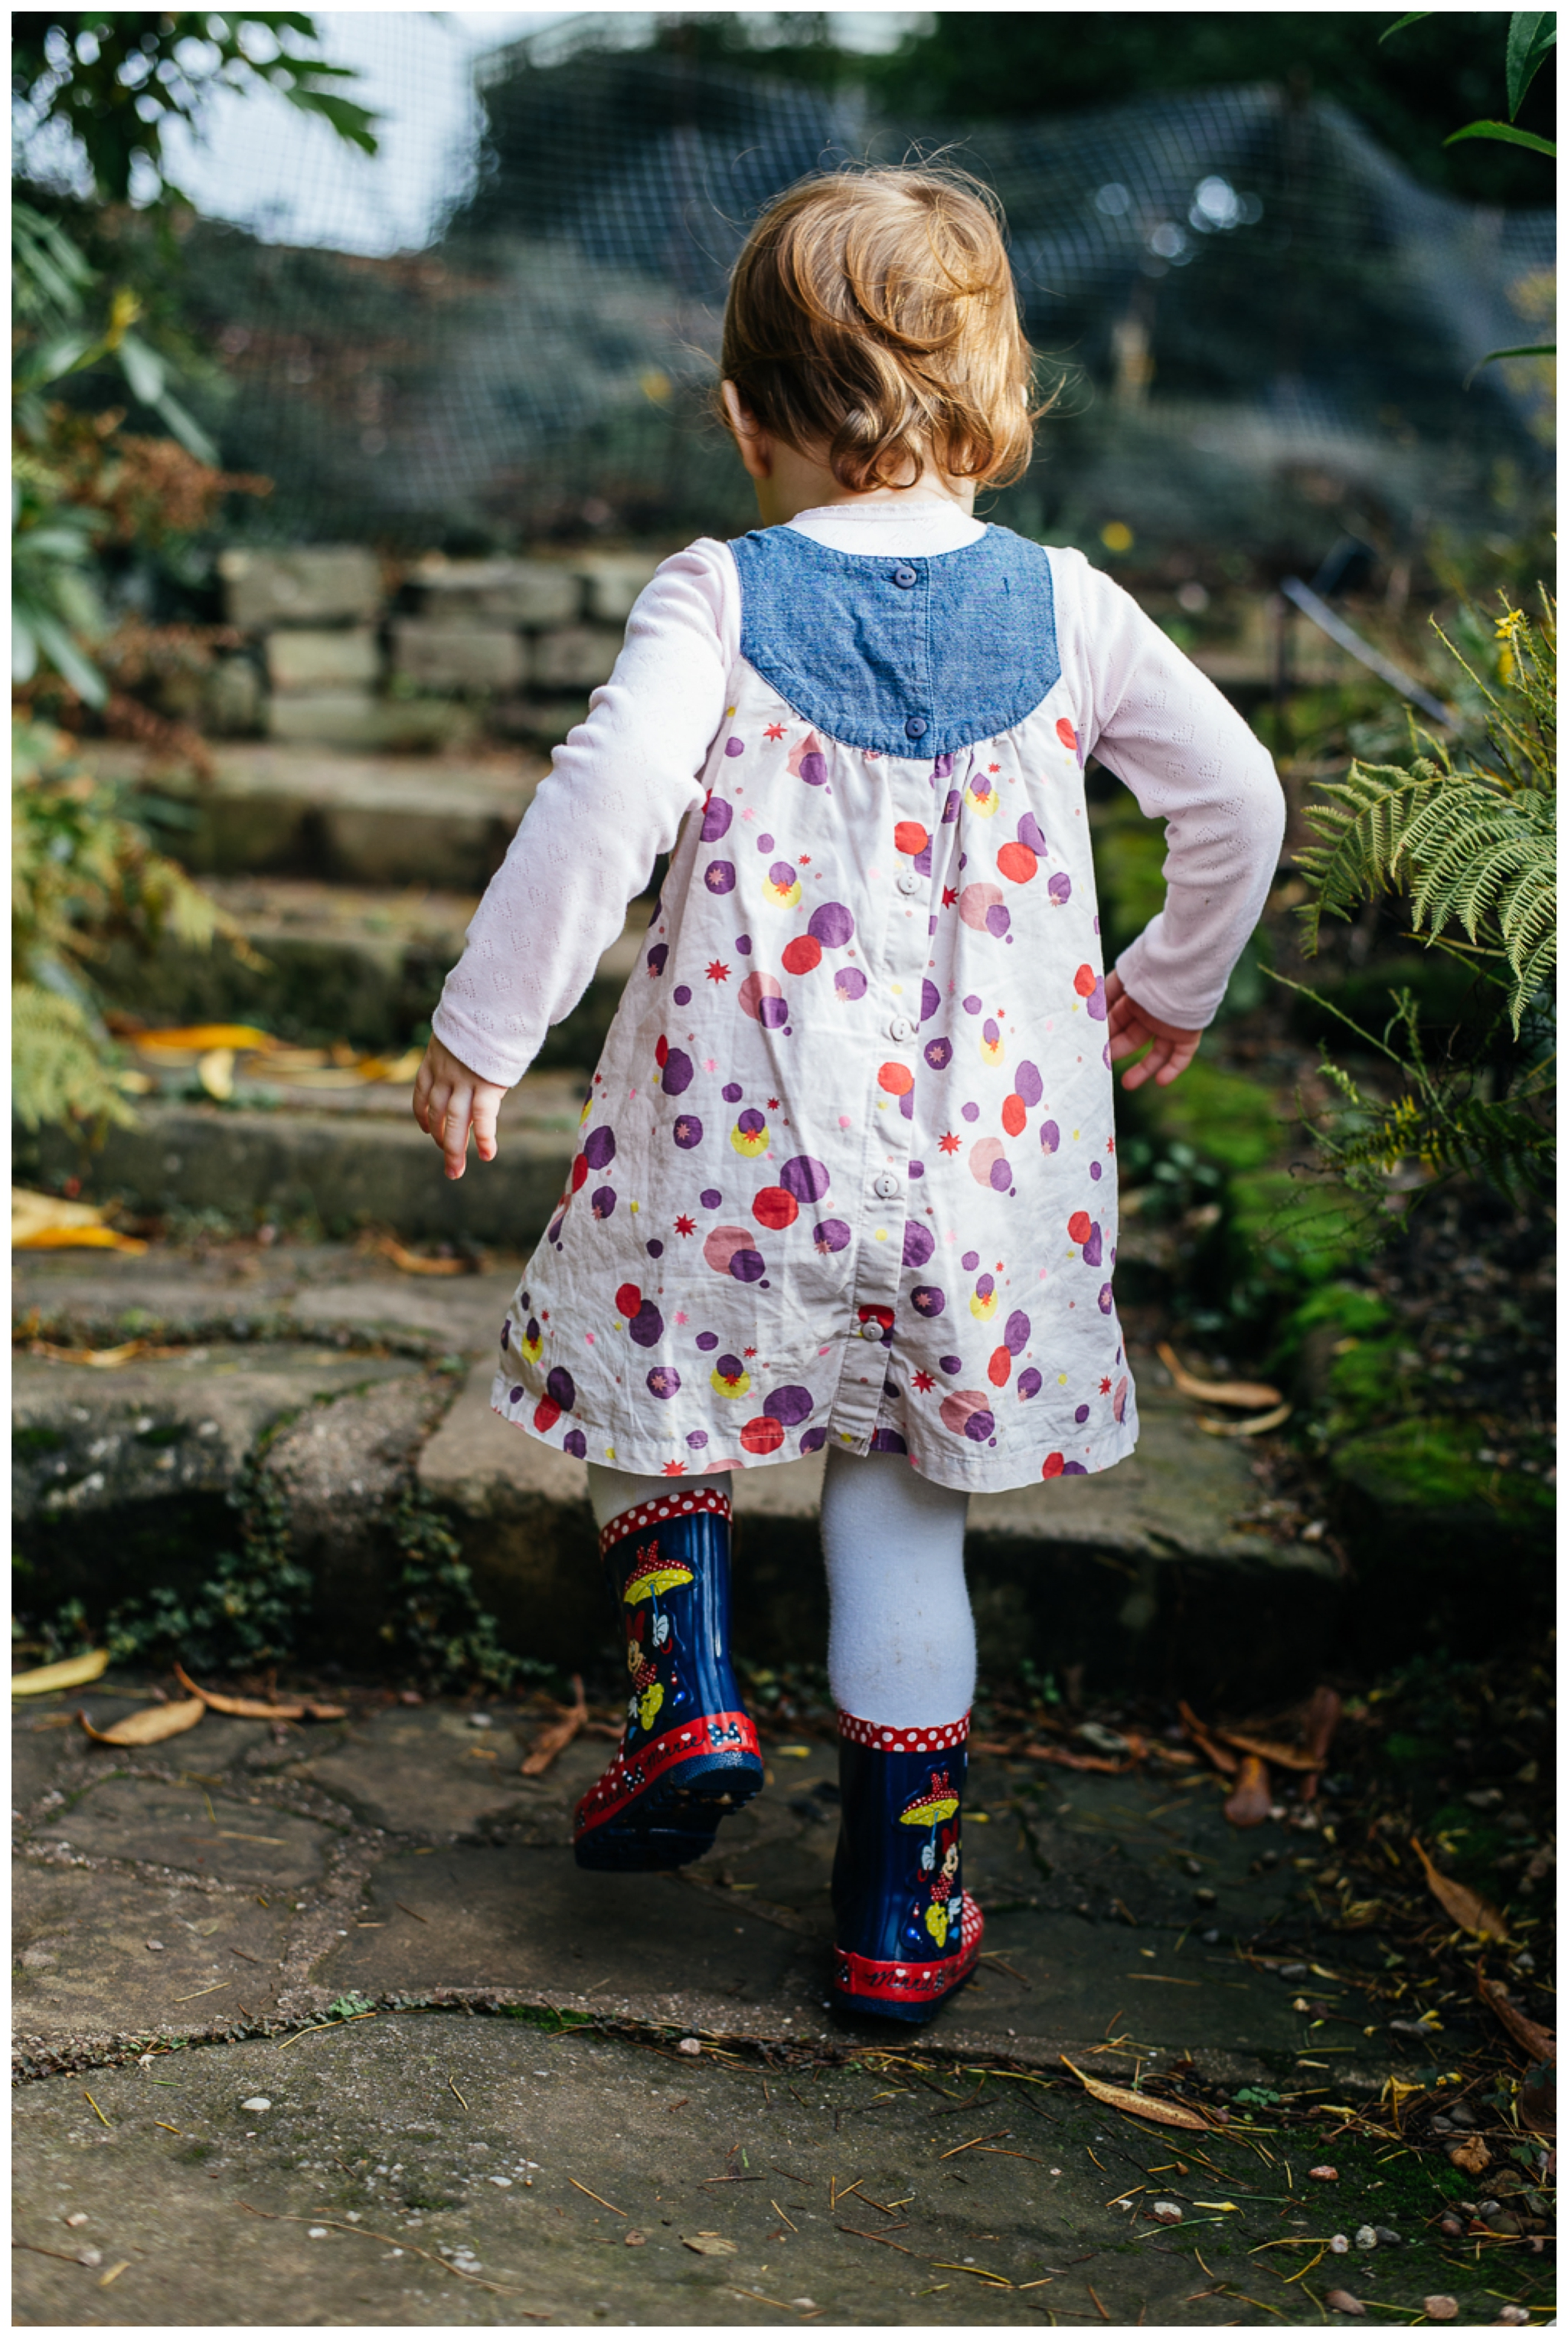 Autumn-family-portraits-birmingham-photographer_0043.jpg